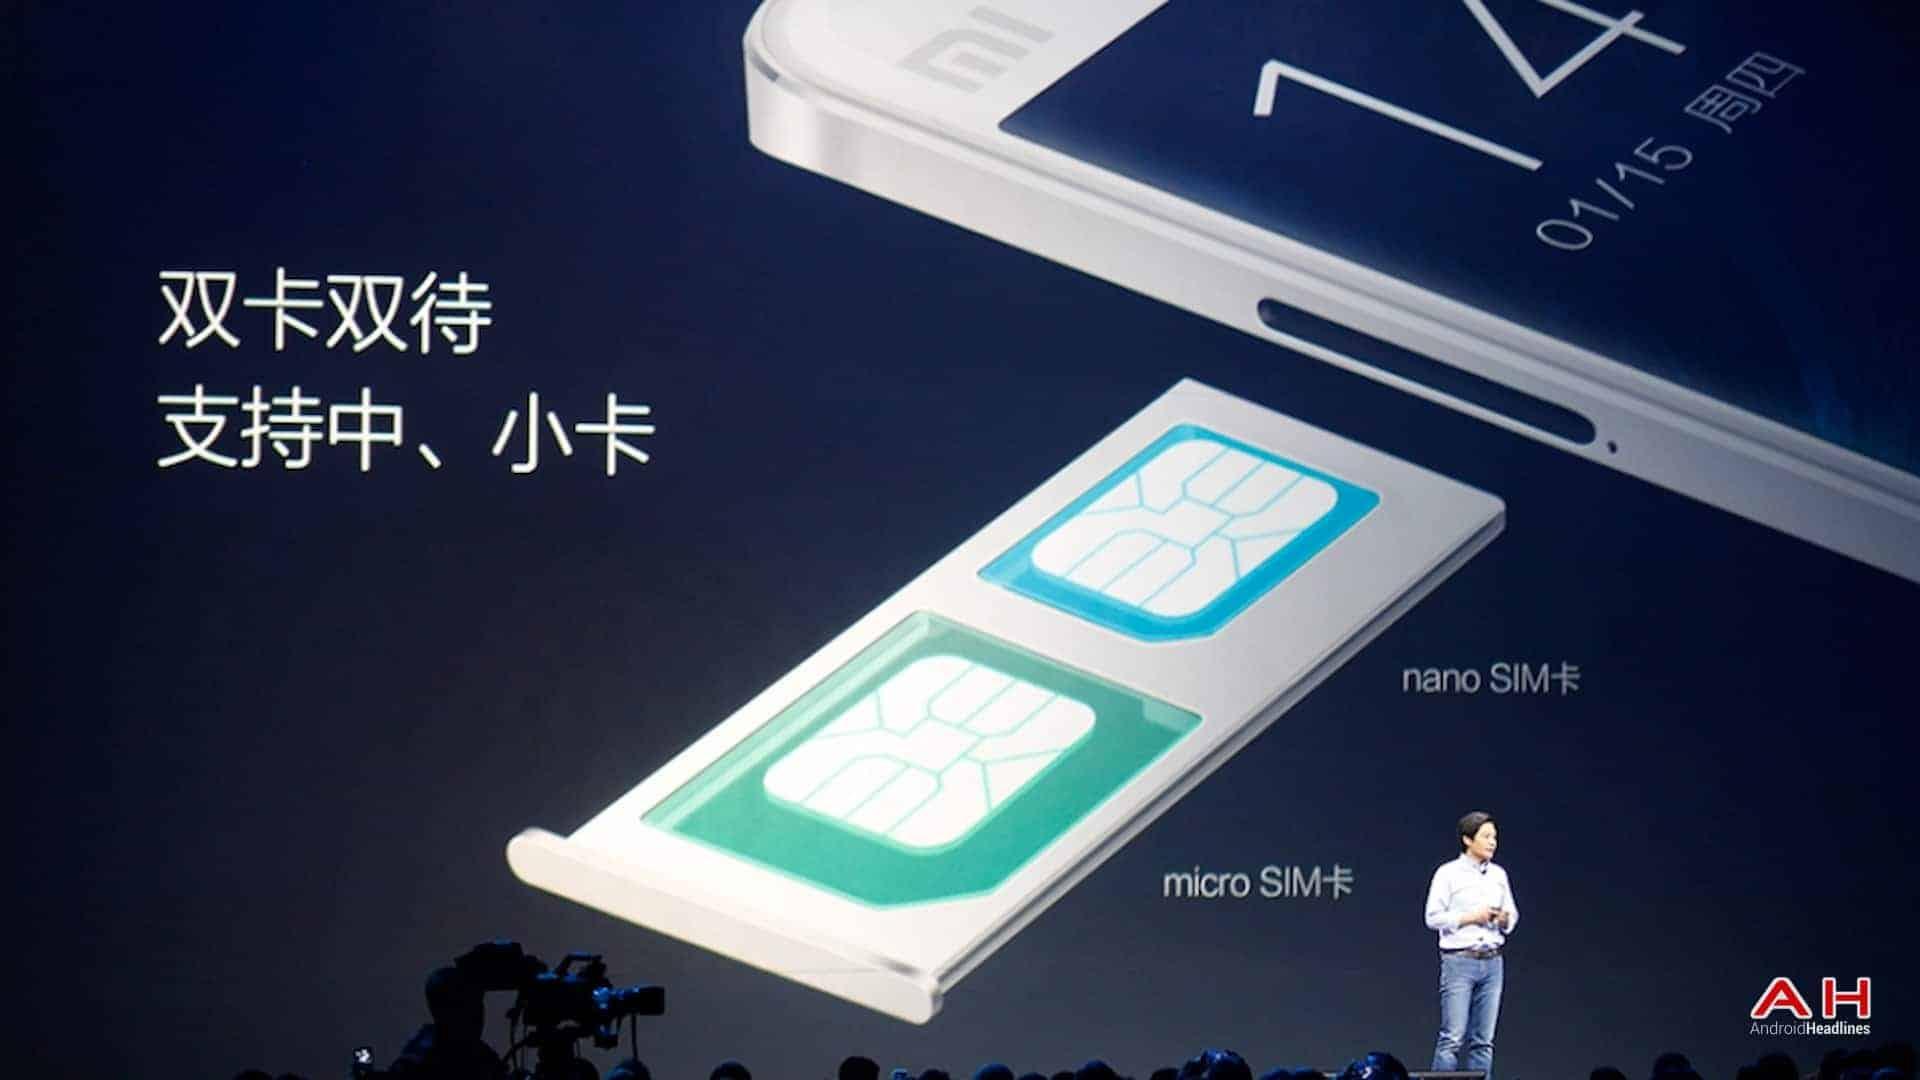 AH Xiaomi Note 13